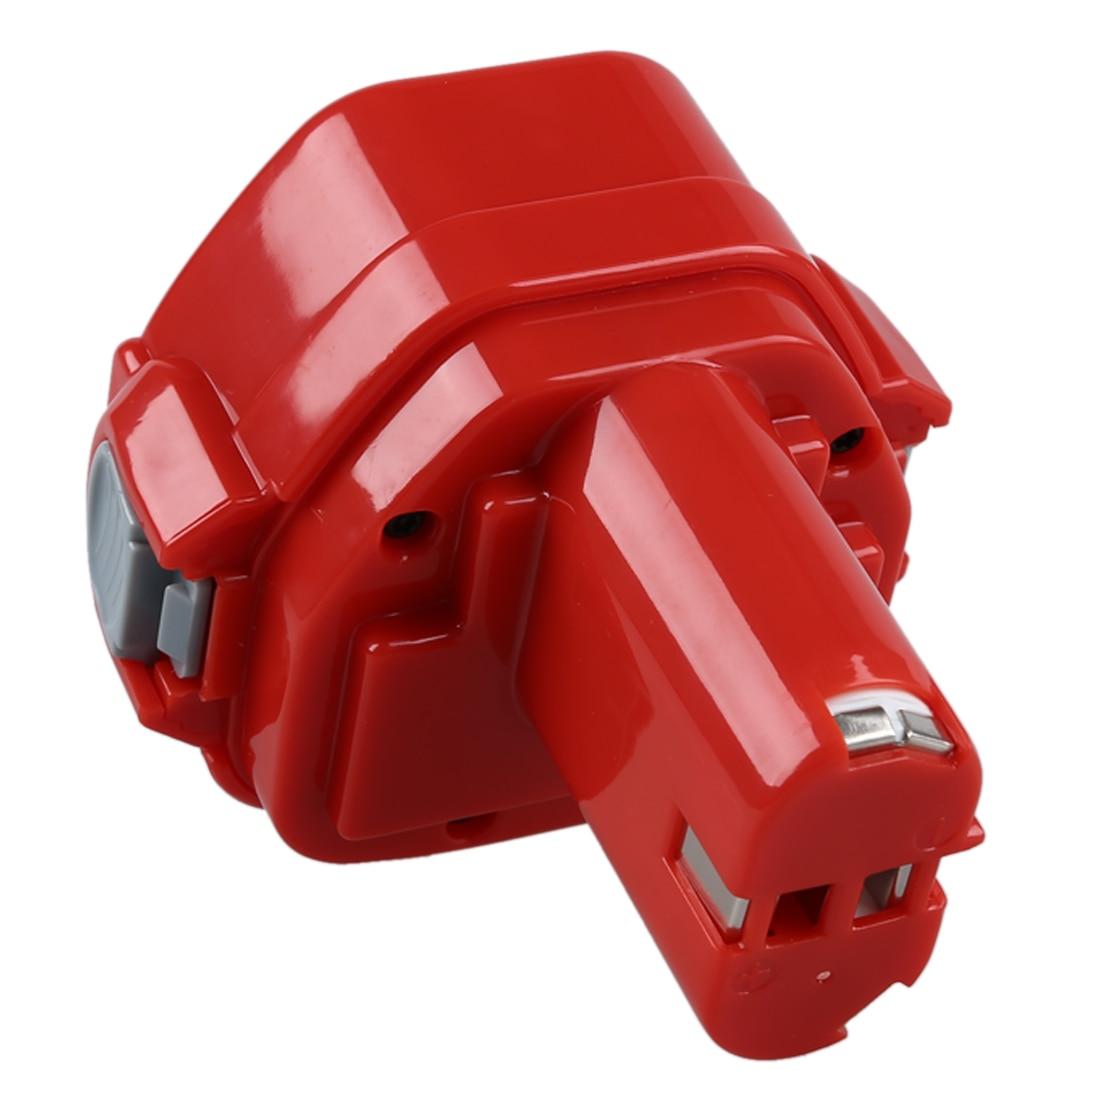 NEW 2.0AH 12V Power Tool Battery for MAKITA Red